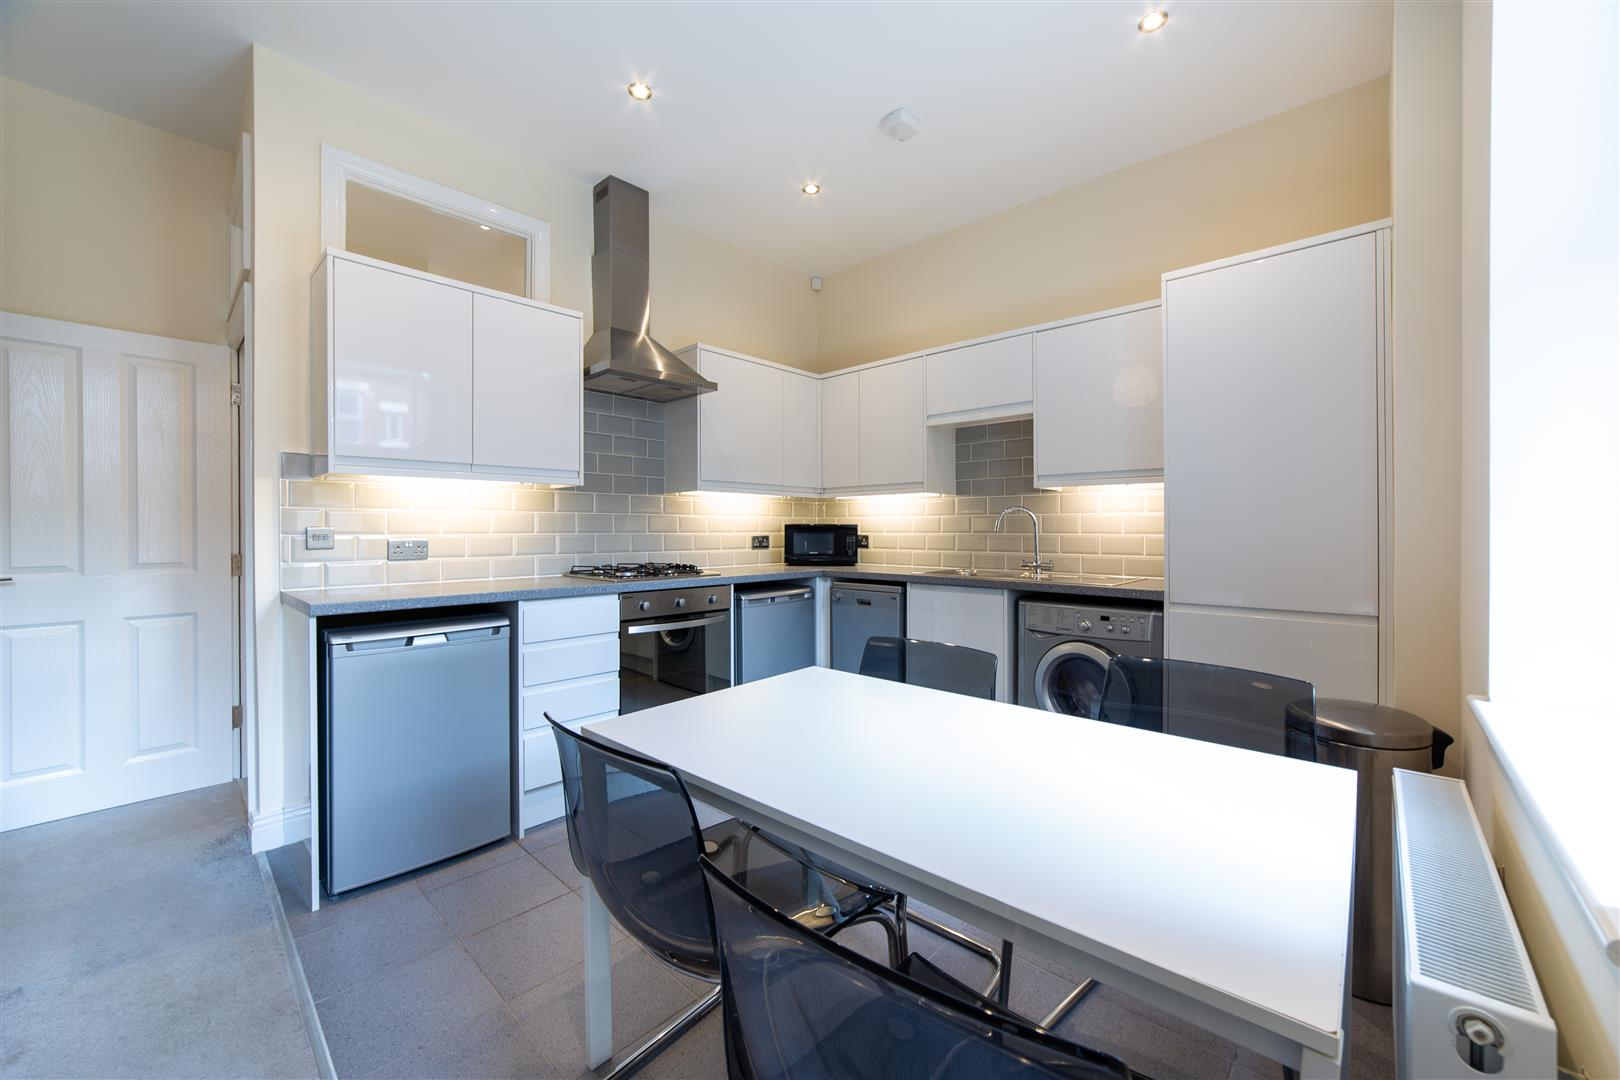 2 bed flat to rent in Newcastle Upon Tyne, NE2 3JA, NE2